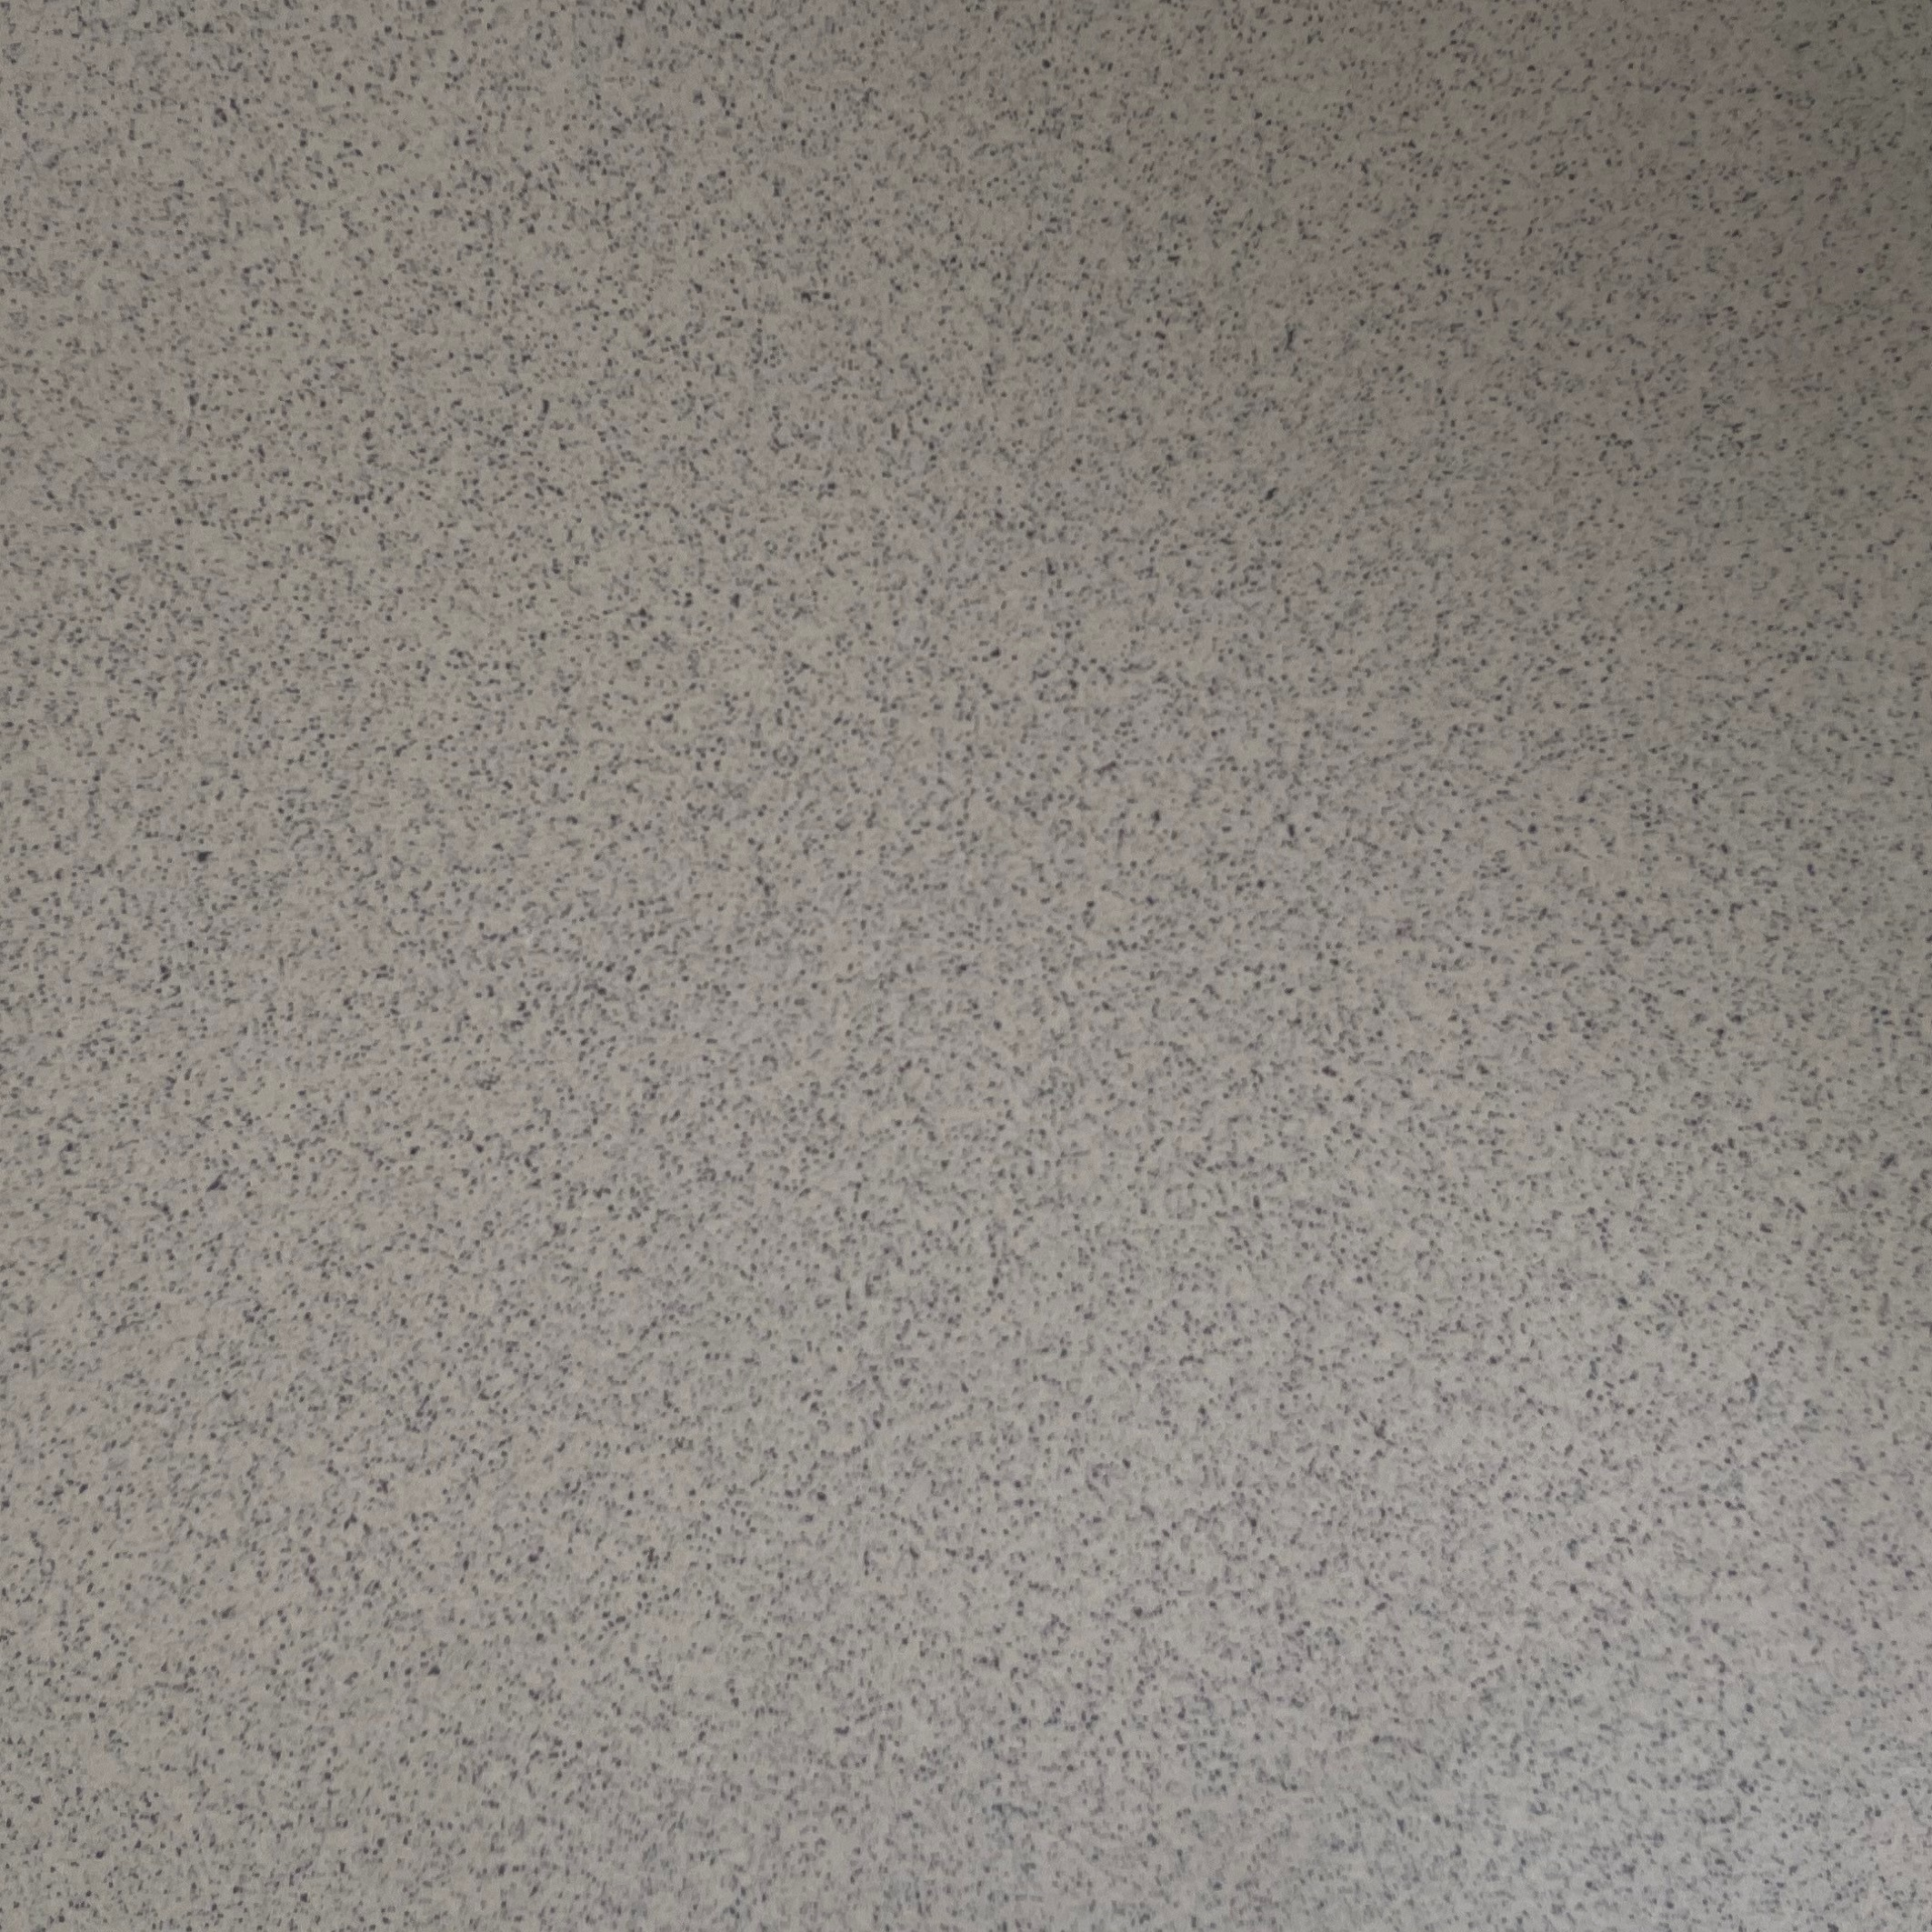 MPS Pandora Blanc creme 30x30cm Bodenfliese R10